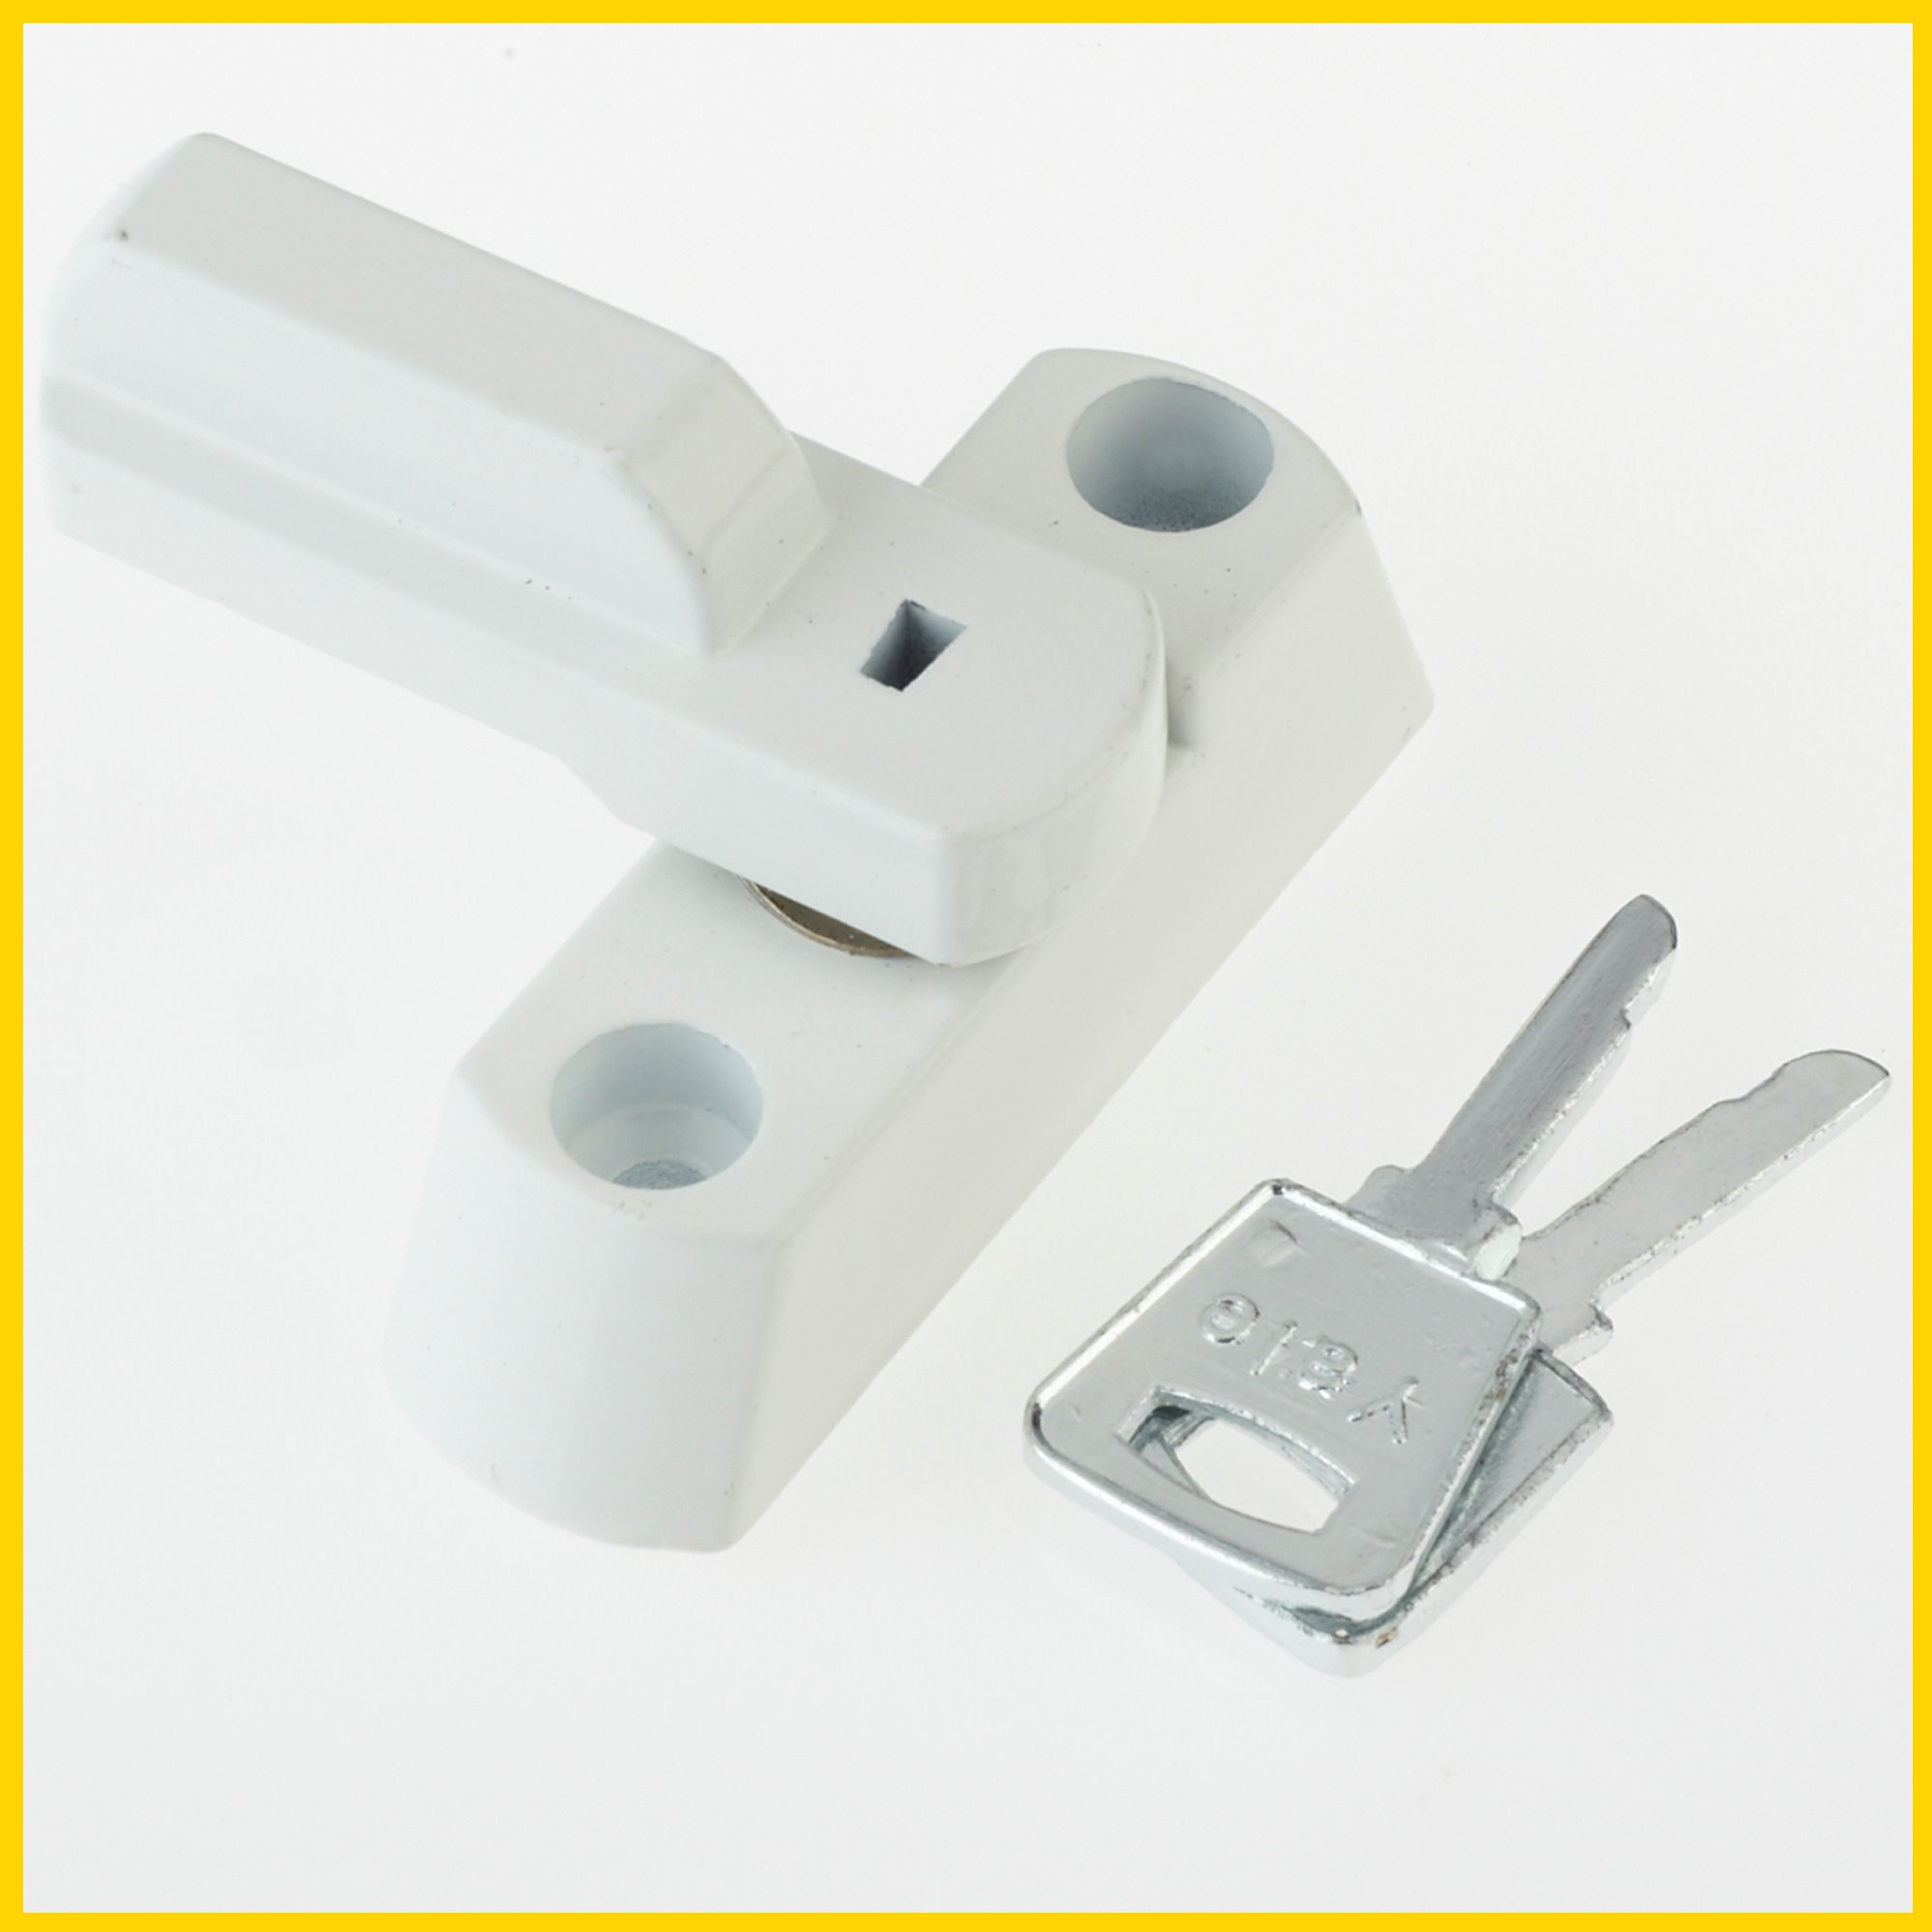 8K103 - PVCu Window Stop